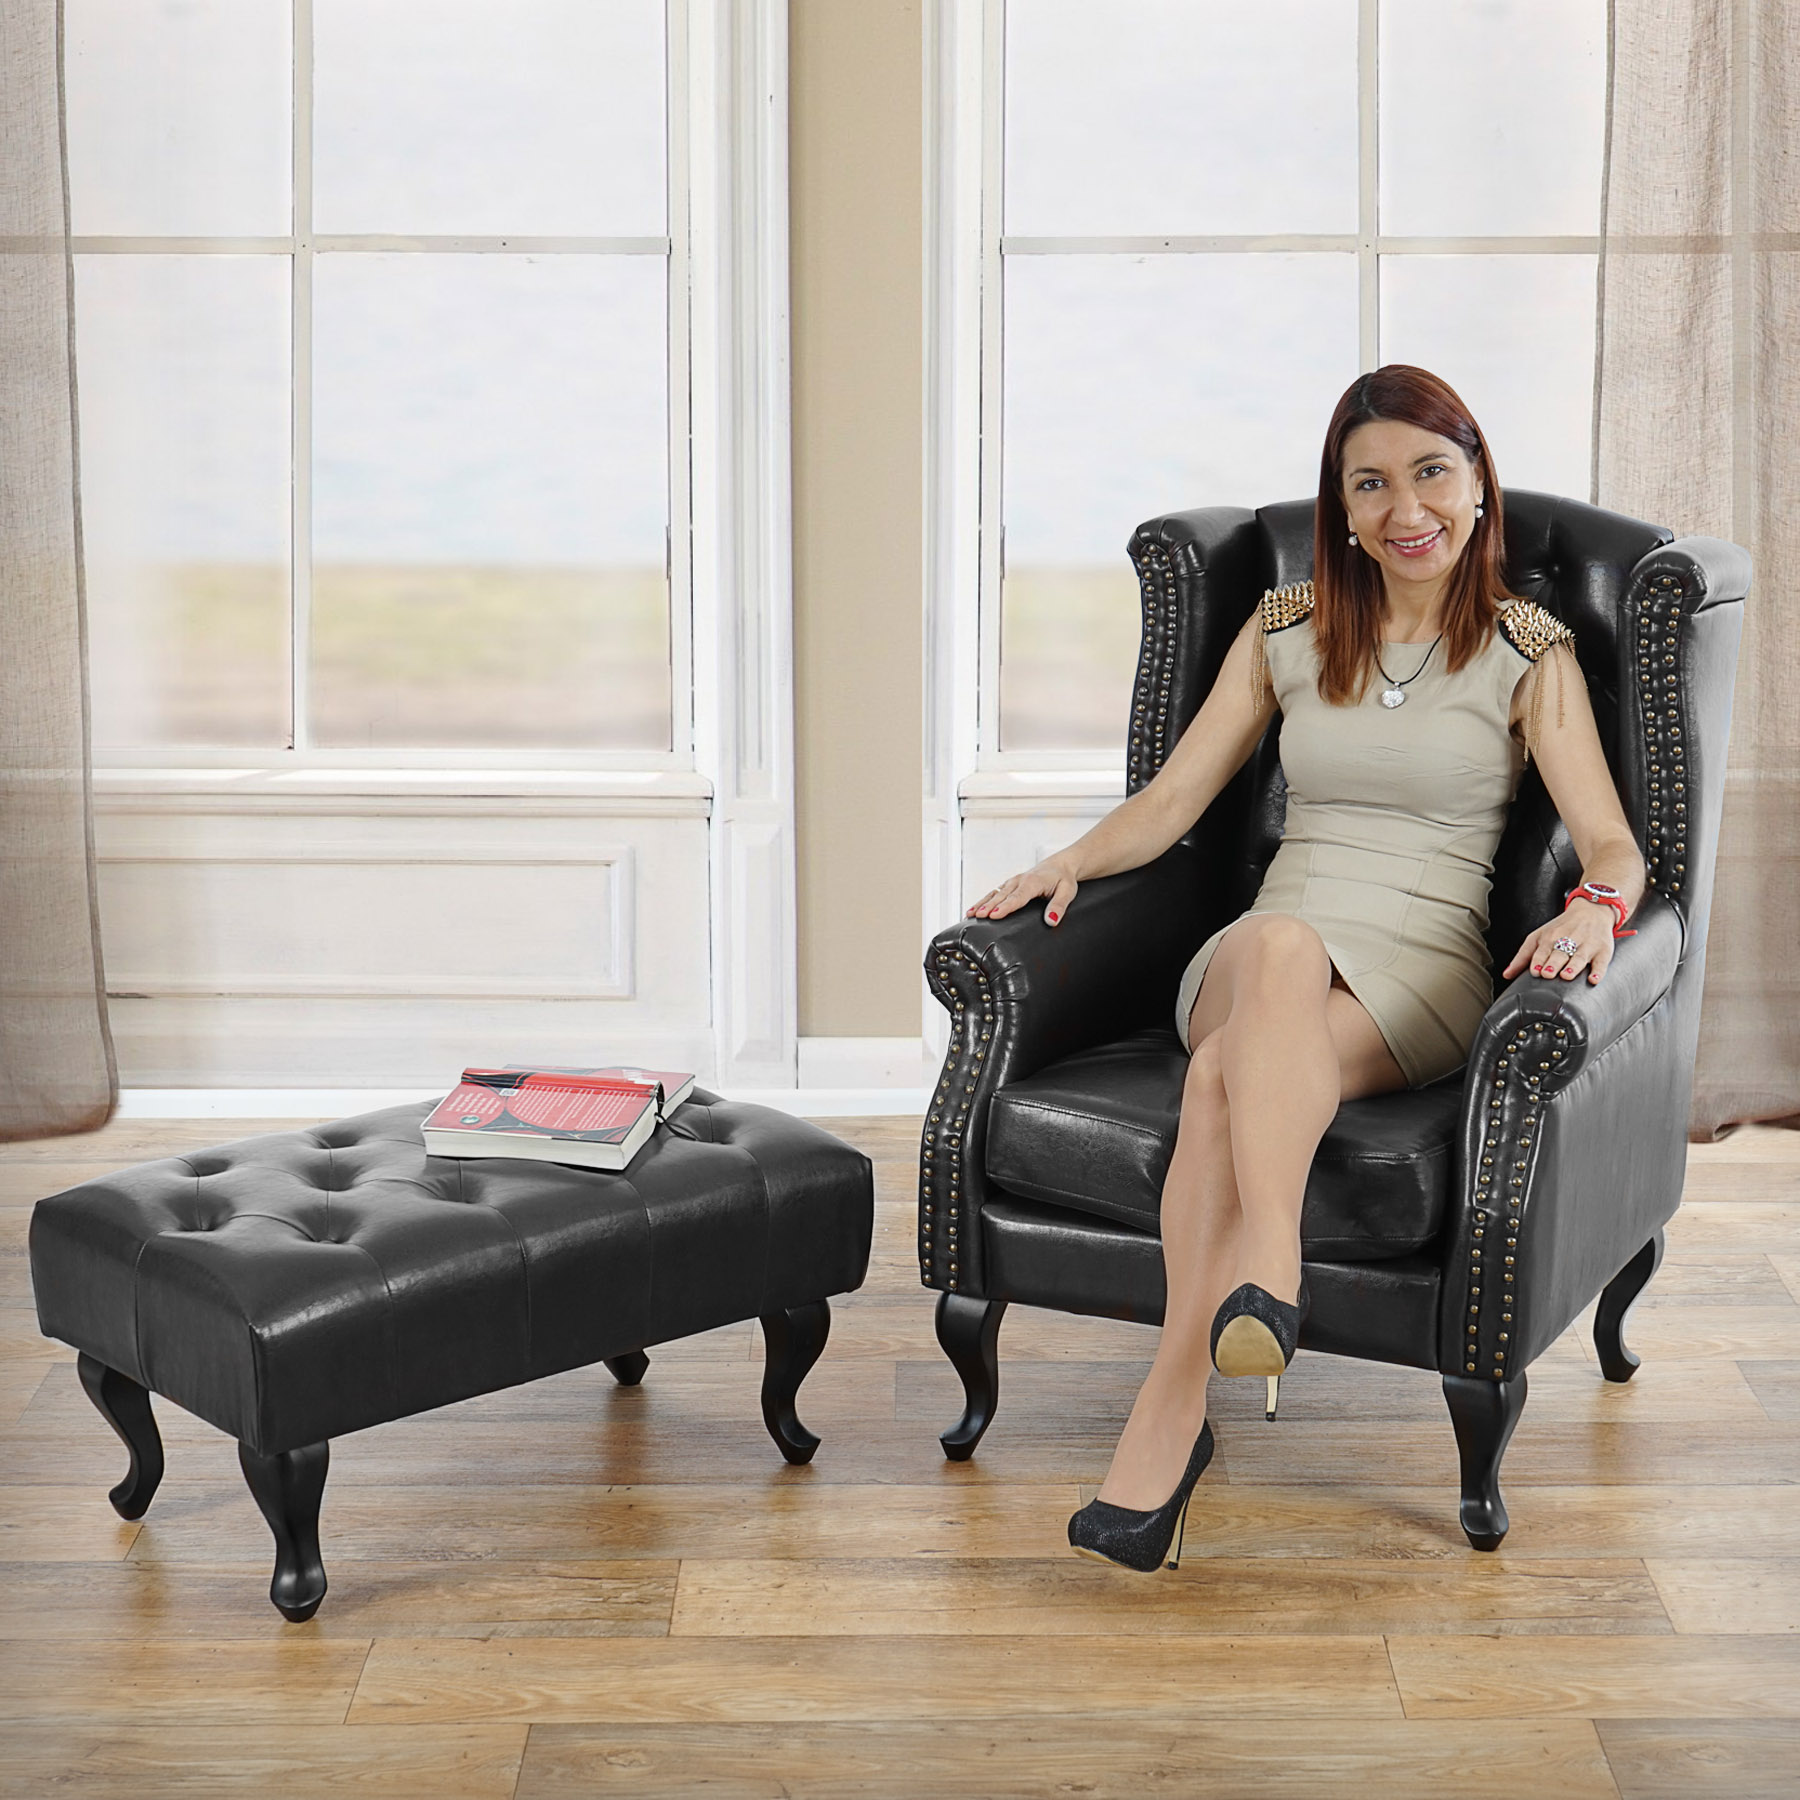 sessel relaxsessel clubsessel ohrensessel chesterfield kunstleder schwarz mit ottomane. Black Bedroom Furniture Sets. Home Design Ideas